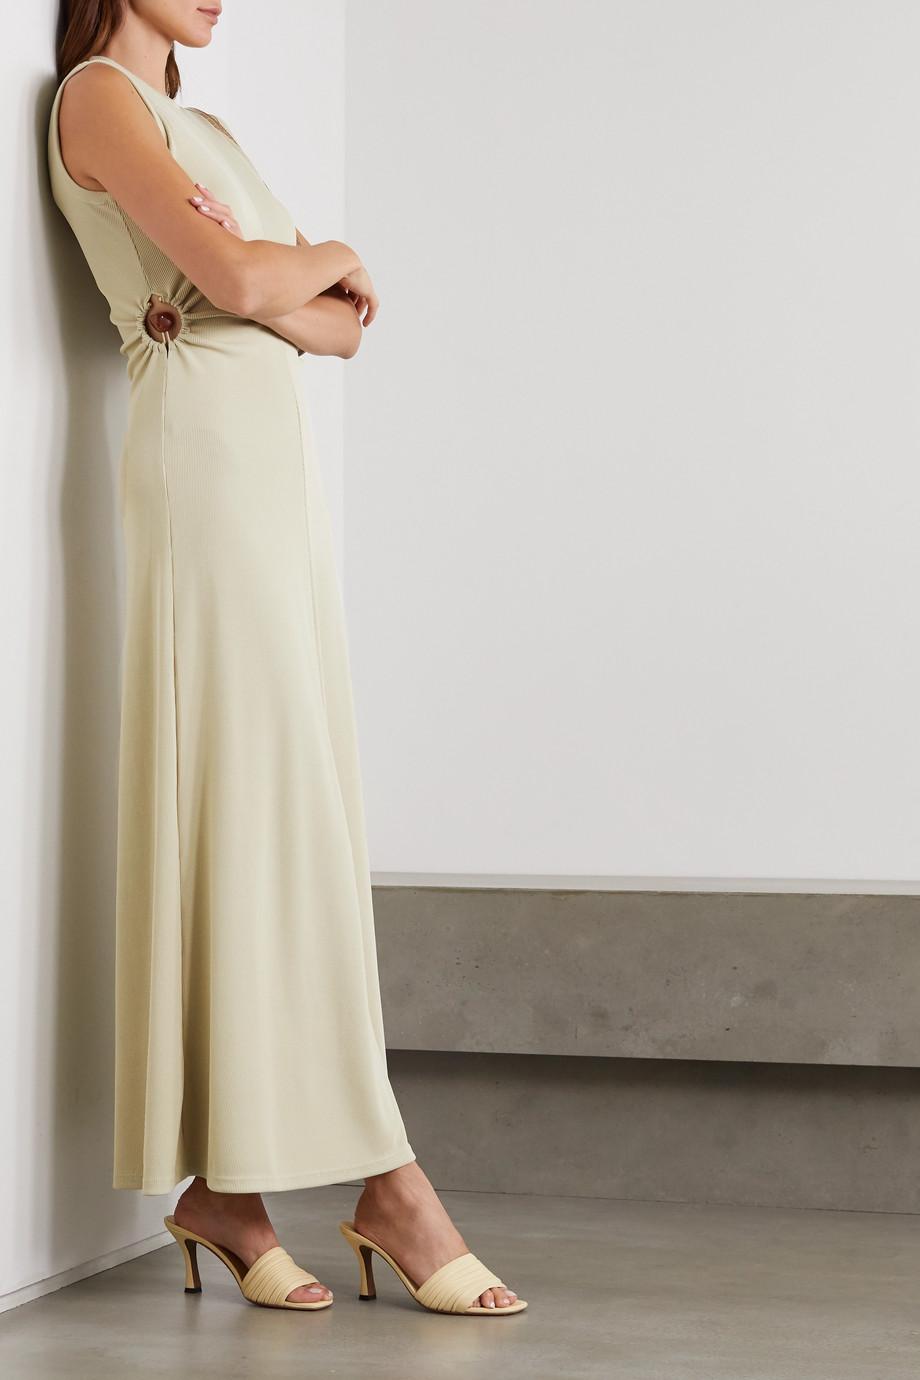 Christopher Esber Orbit Fran embellished cutout ribbed-knit maxi dress